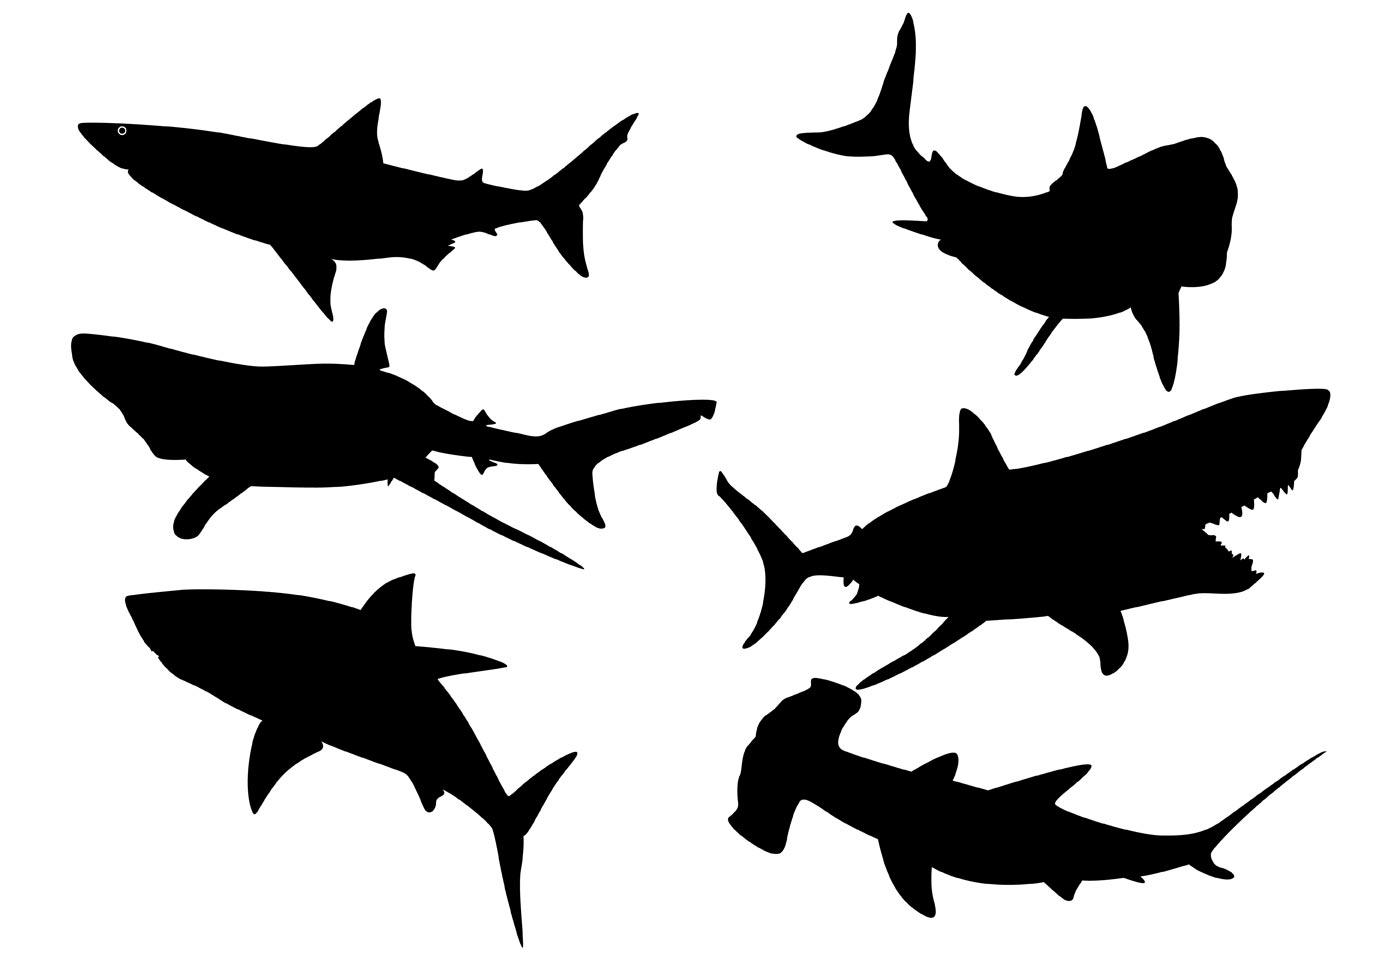 shark silouette fish vector silhouette archives sv stock blog silouette shark